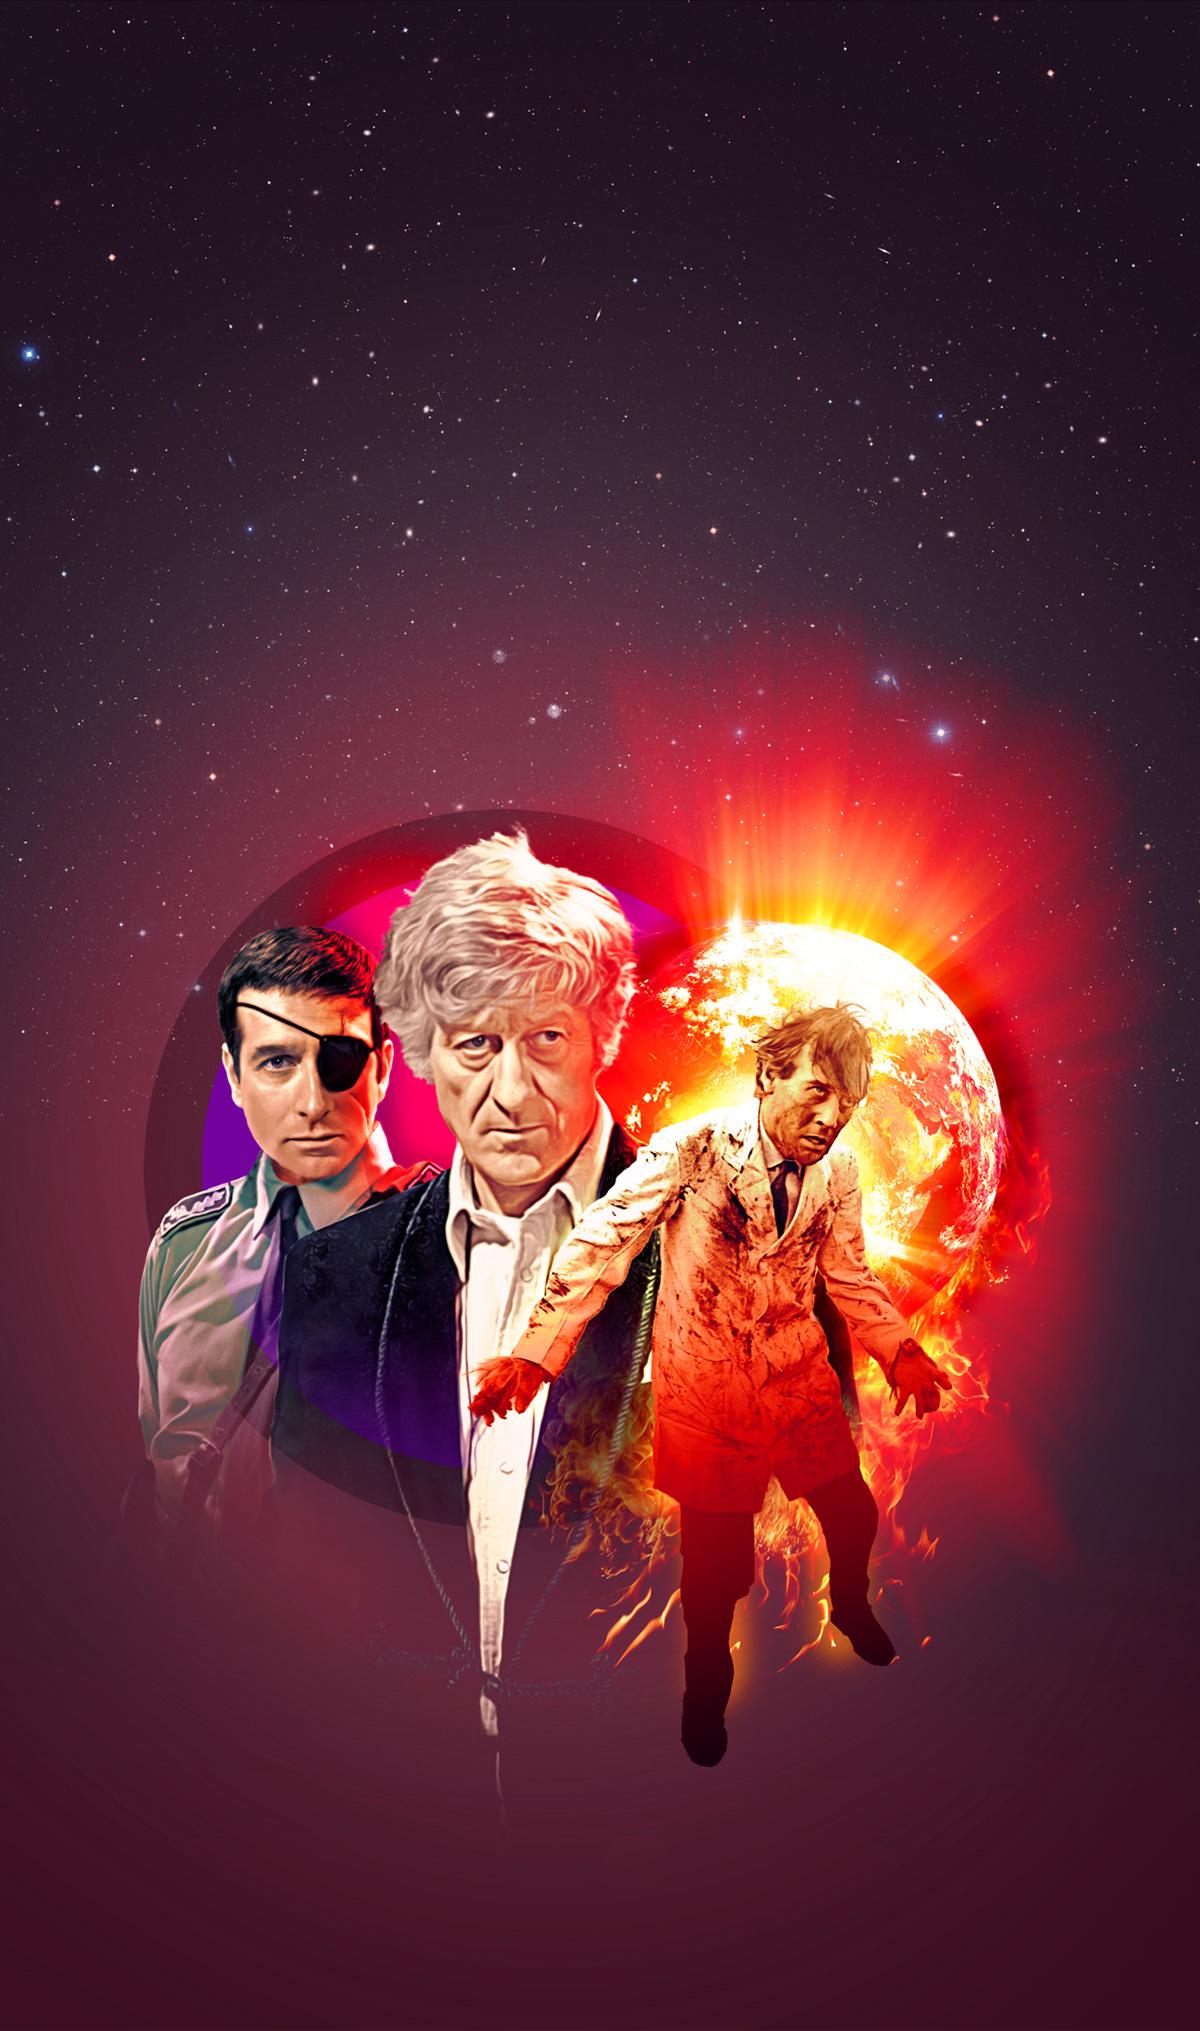 Lee Binding Doctor Who Dvd Artwork